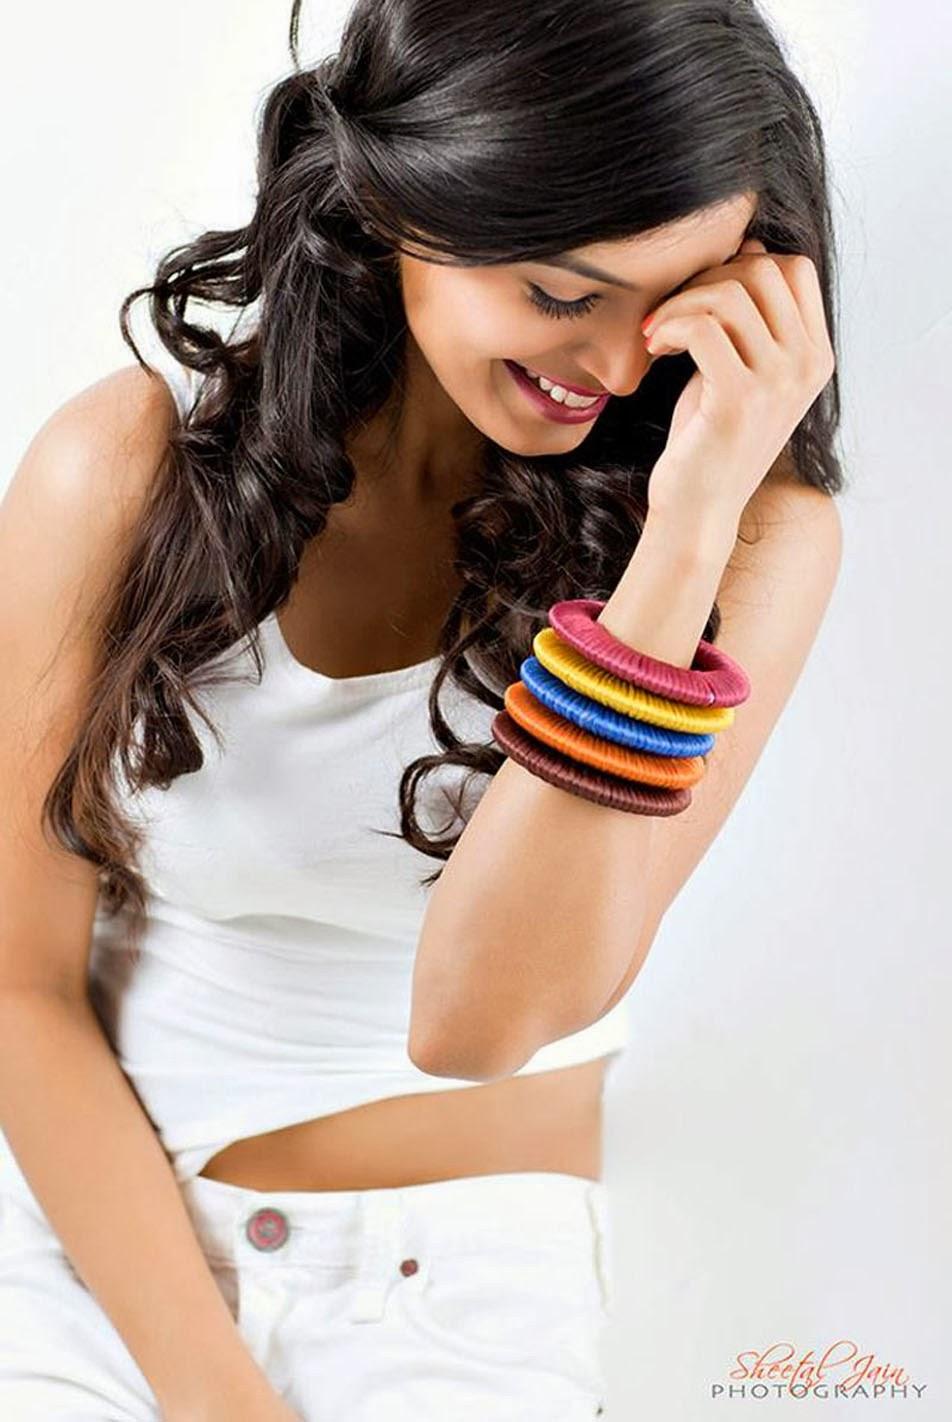 Actress sanchita shetty sex tape alleged